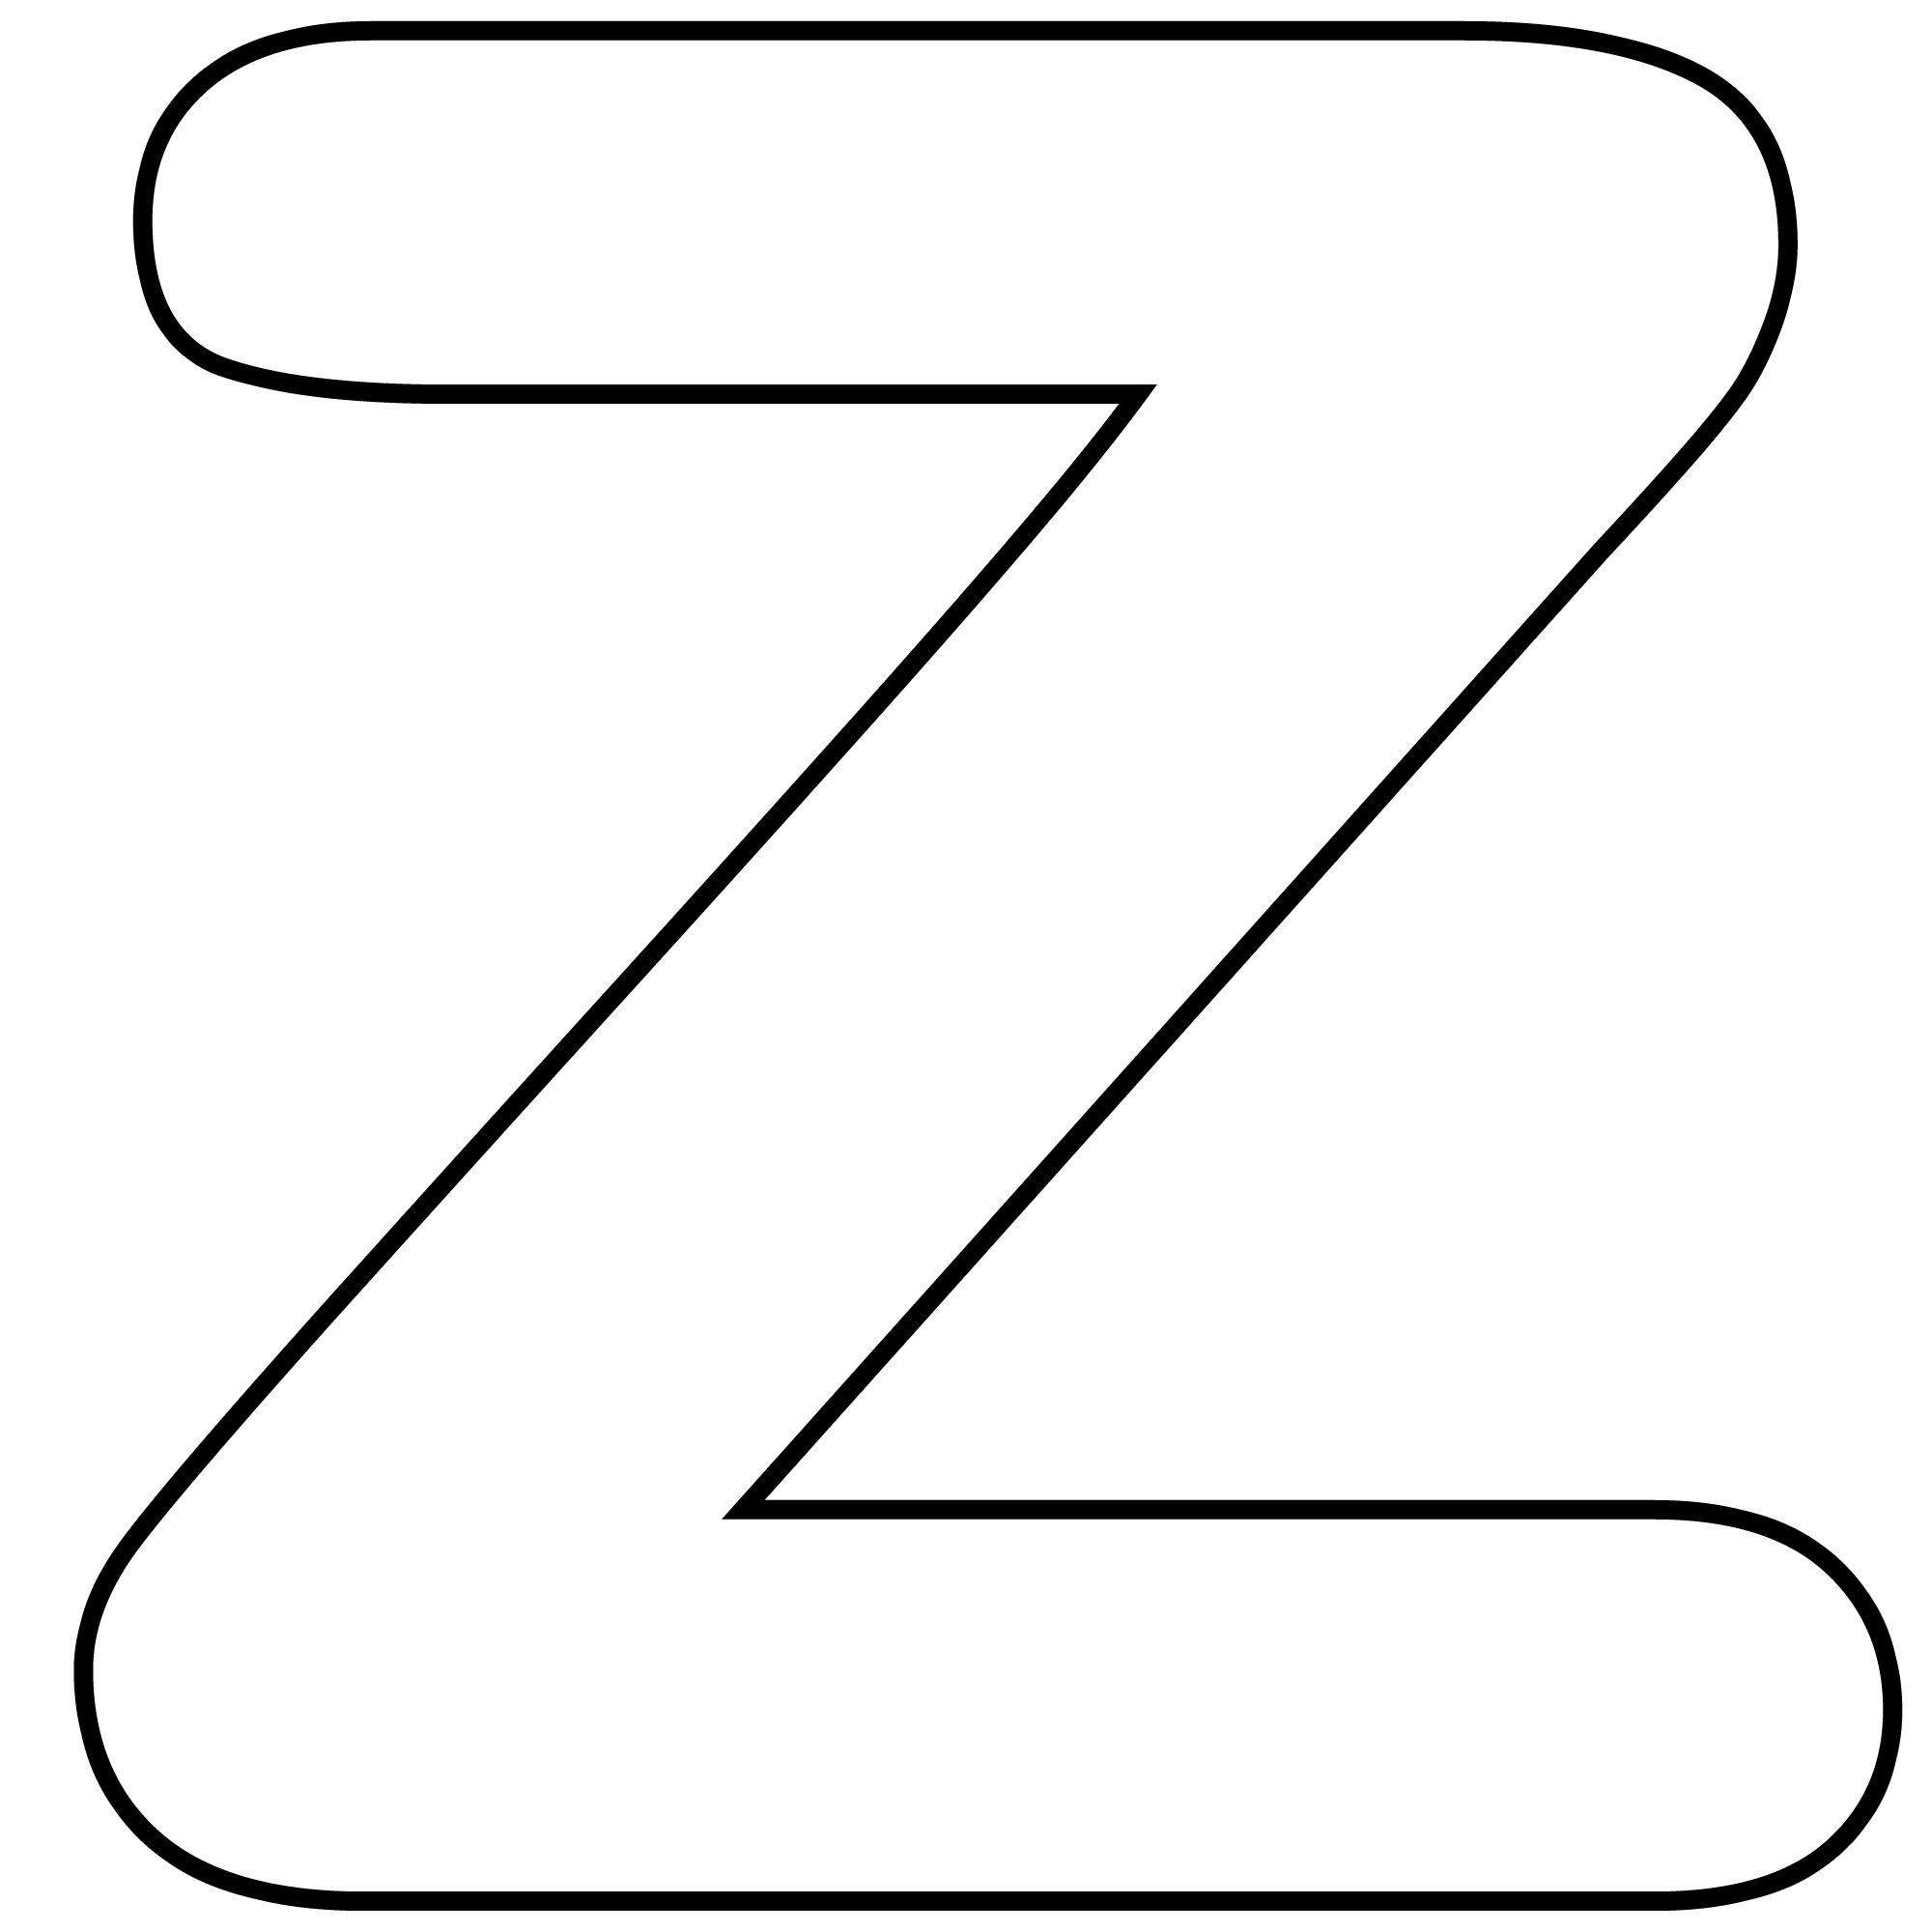 Letter Z - Dr. Odd   daycare   Pinterest   Alphabet ...